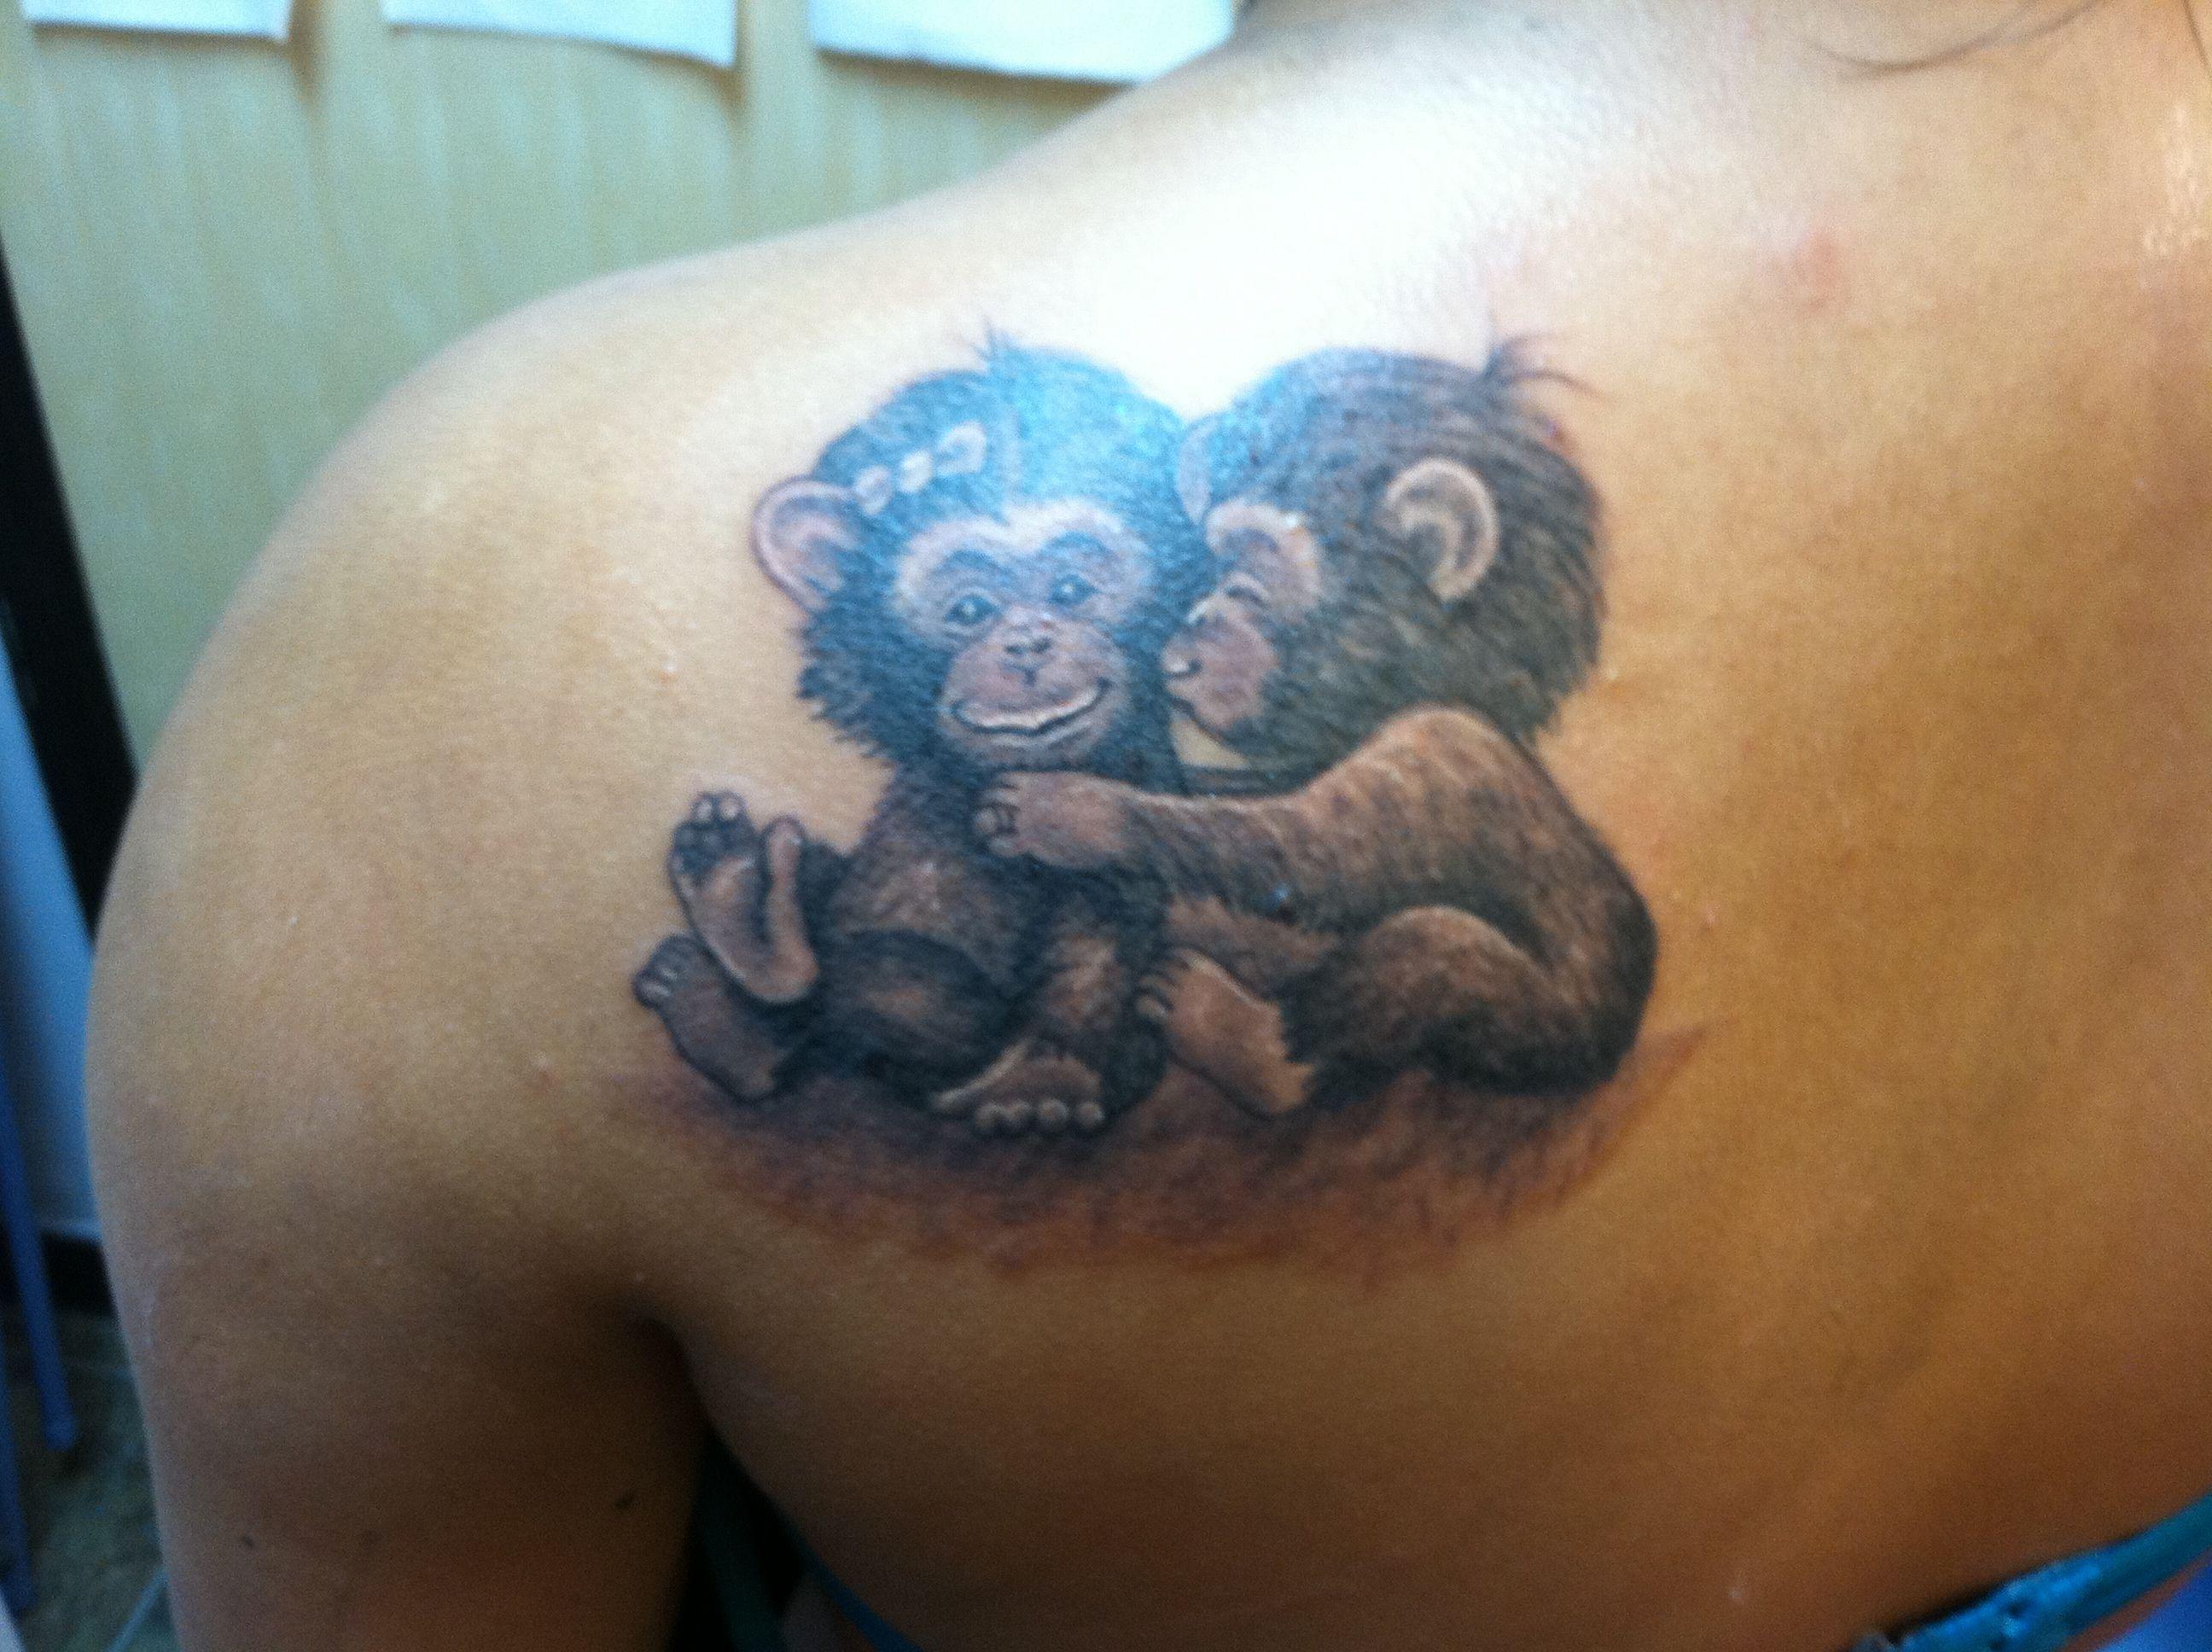 Cute cartoon realistic monkey tattoo tattoo pinterest for Baby monkey tattoos